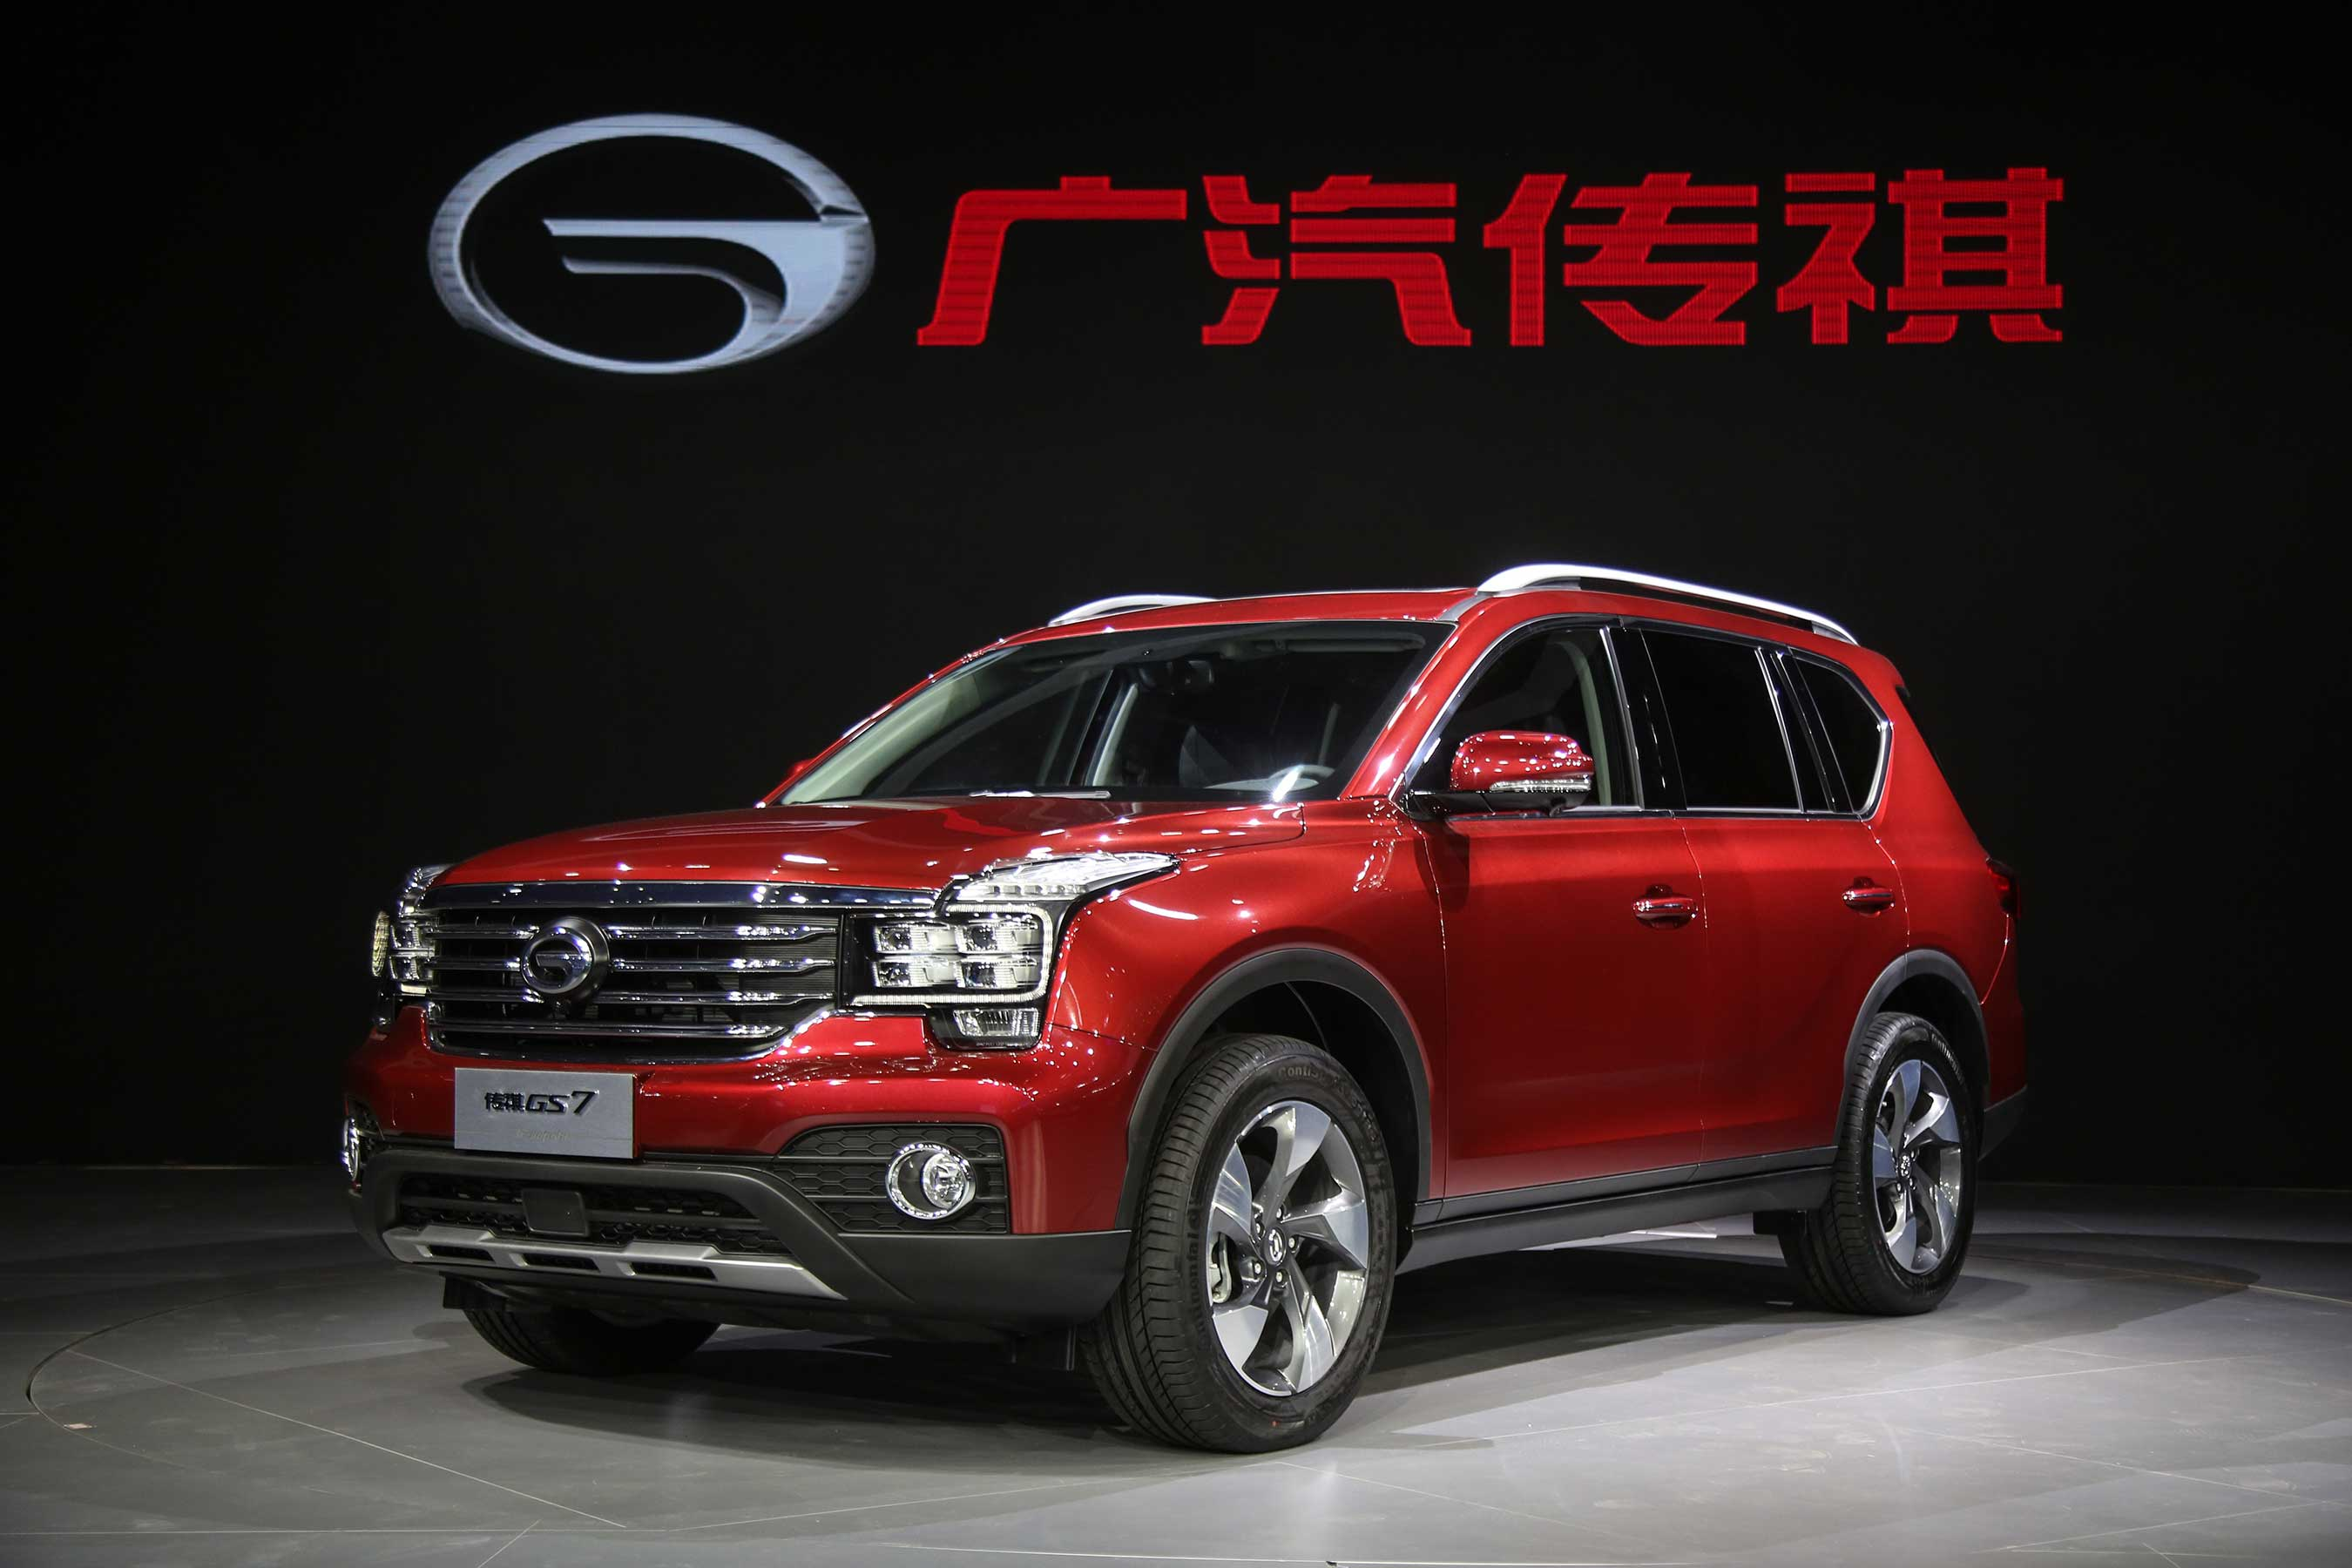 Gac motor brings six signature models to auto shanghai 2017 - Auto motor show ...